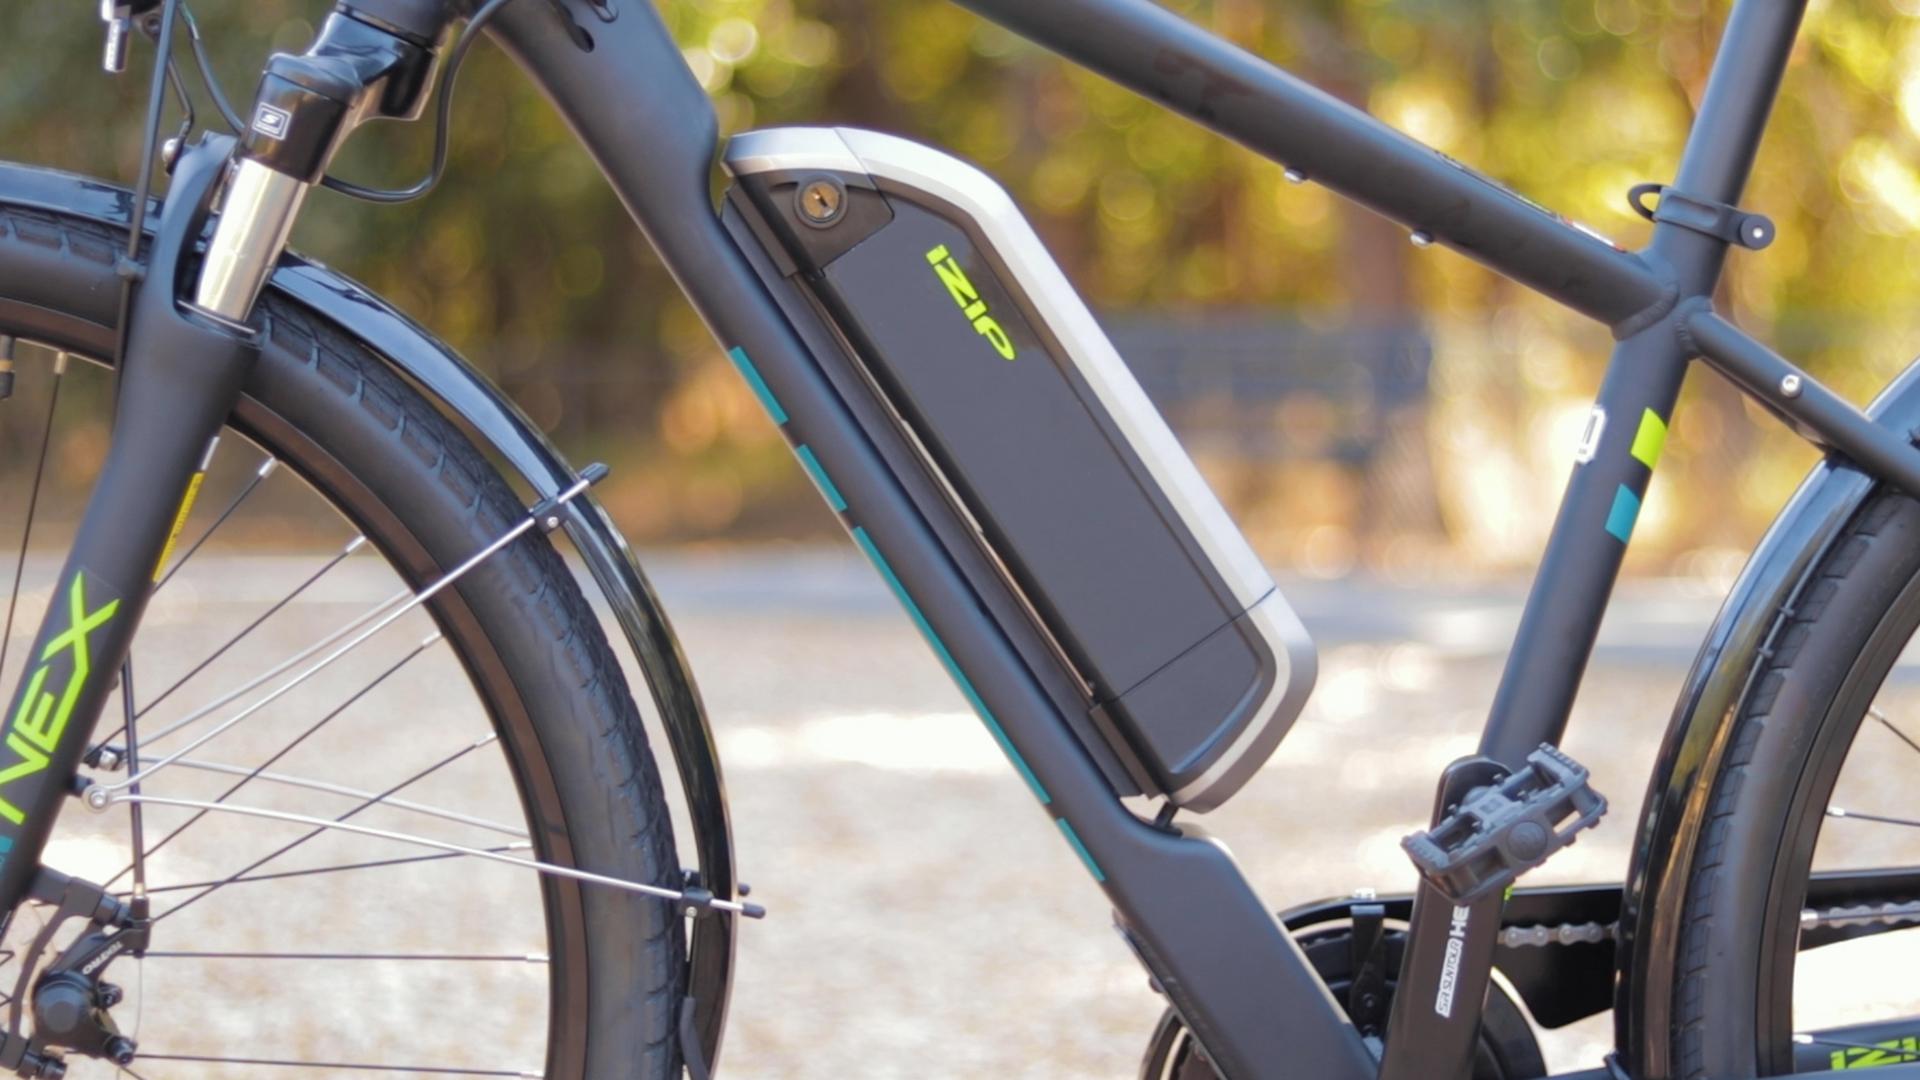 electrified-reviews-izip-e3-brio-electric-bike-review-battery.jpg